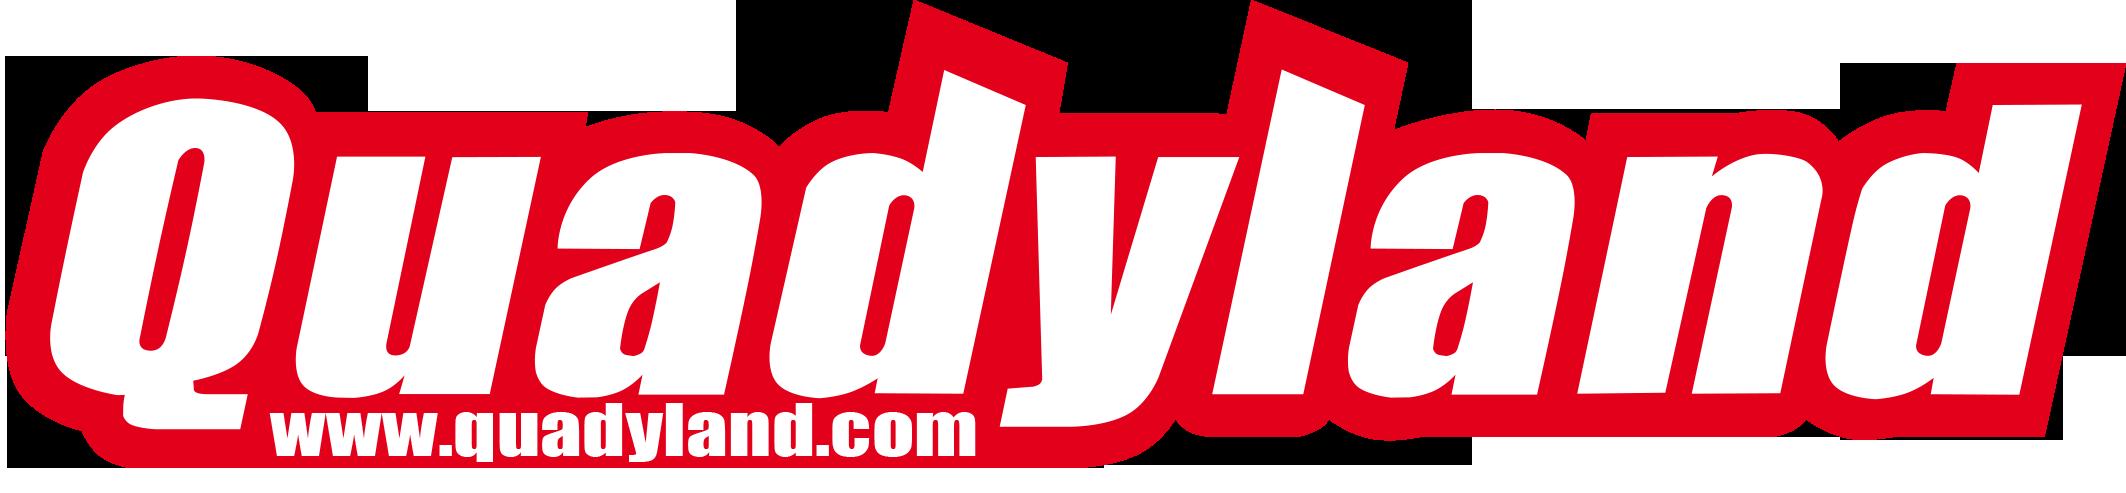 Logo_quadyland_2010_10.png